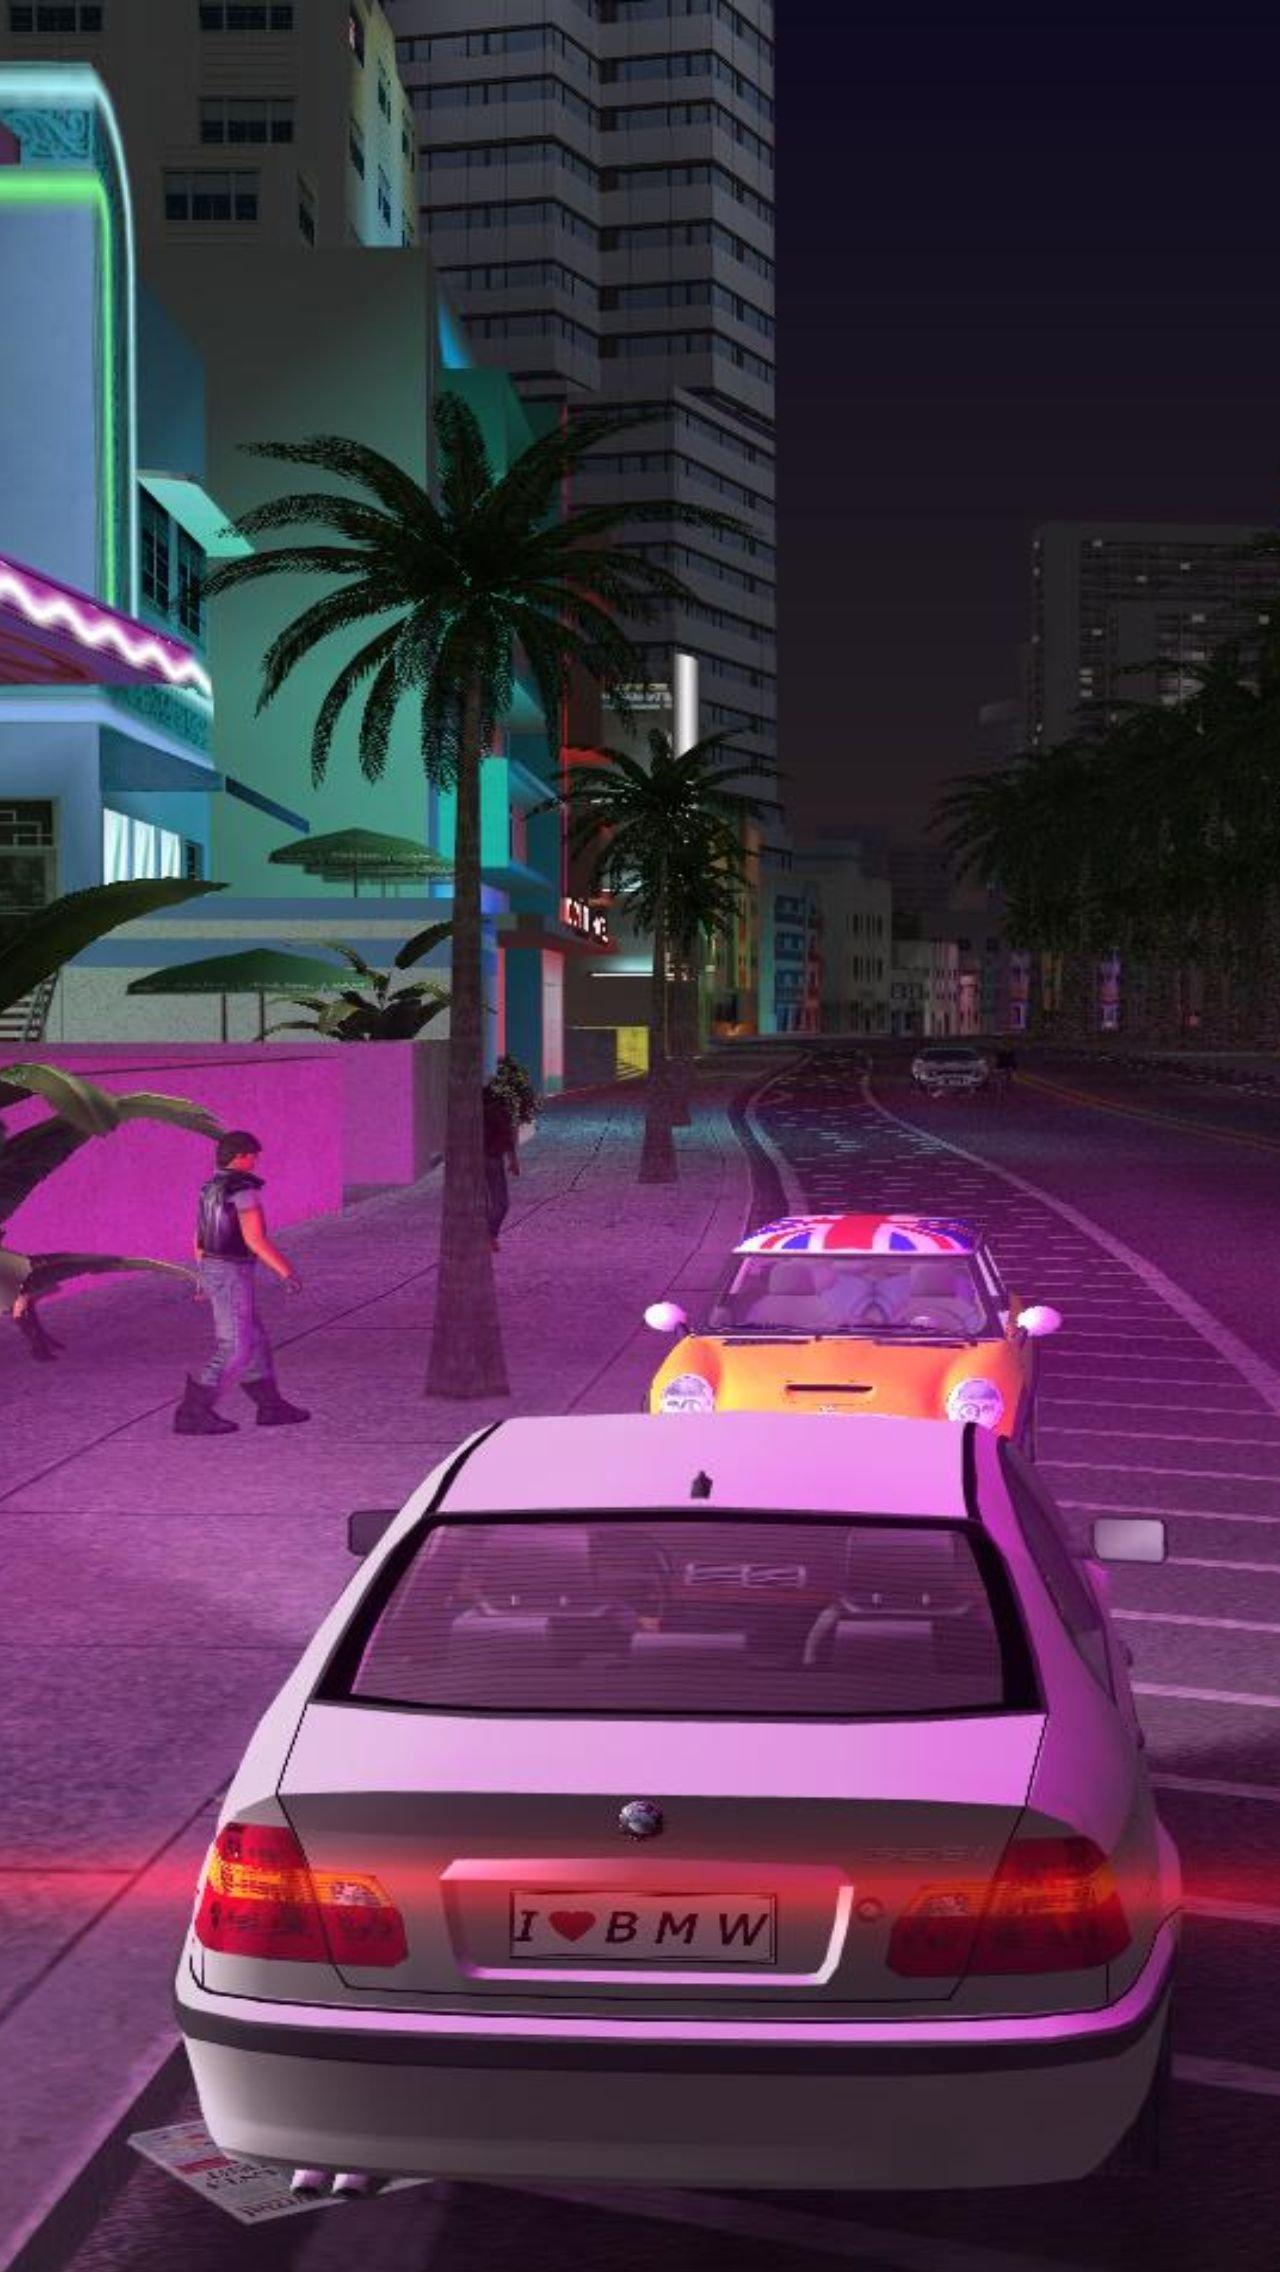 GTA: Vice City – The Driver